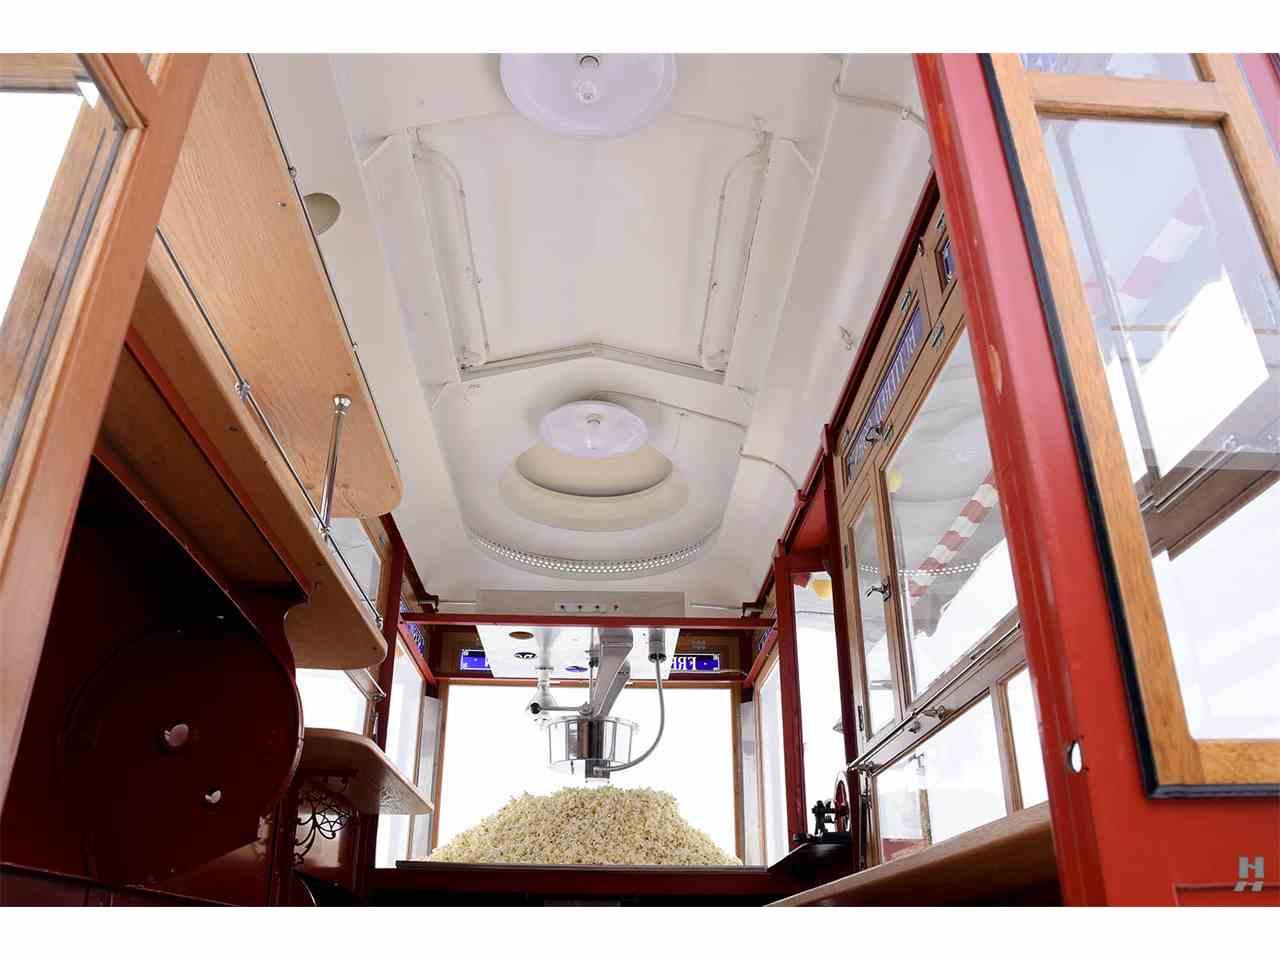 Large Picture of 1910 Cretors Model D - $68,500.00 Offered by Hyman Ltd. Classic Cars - JMNV